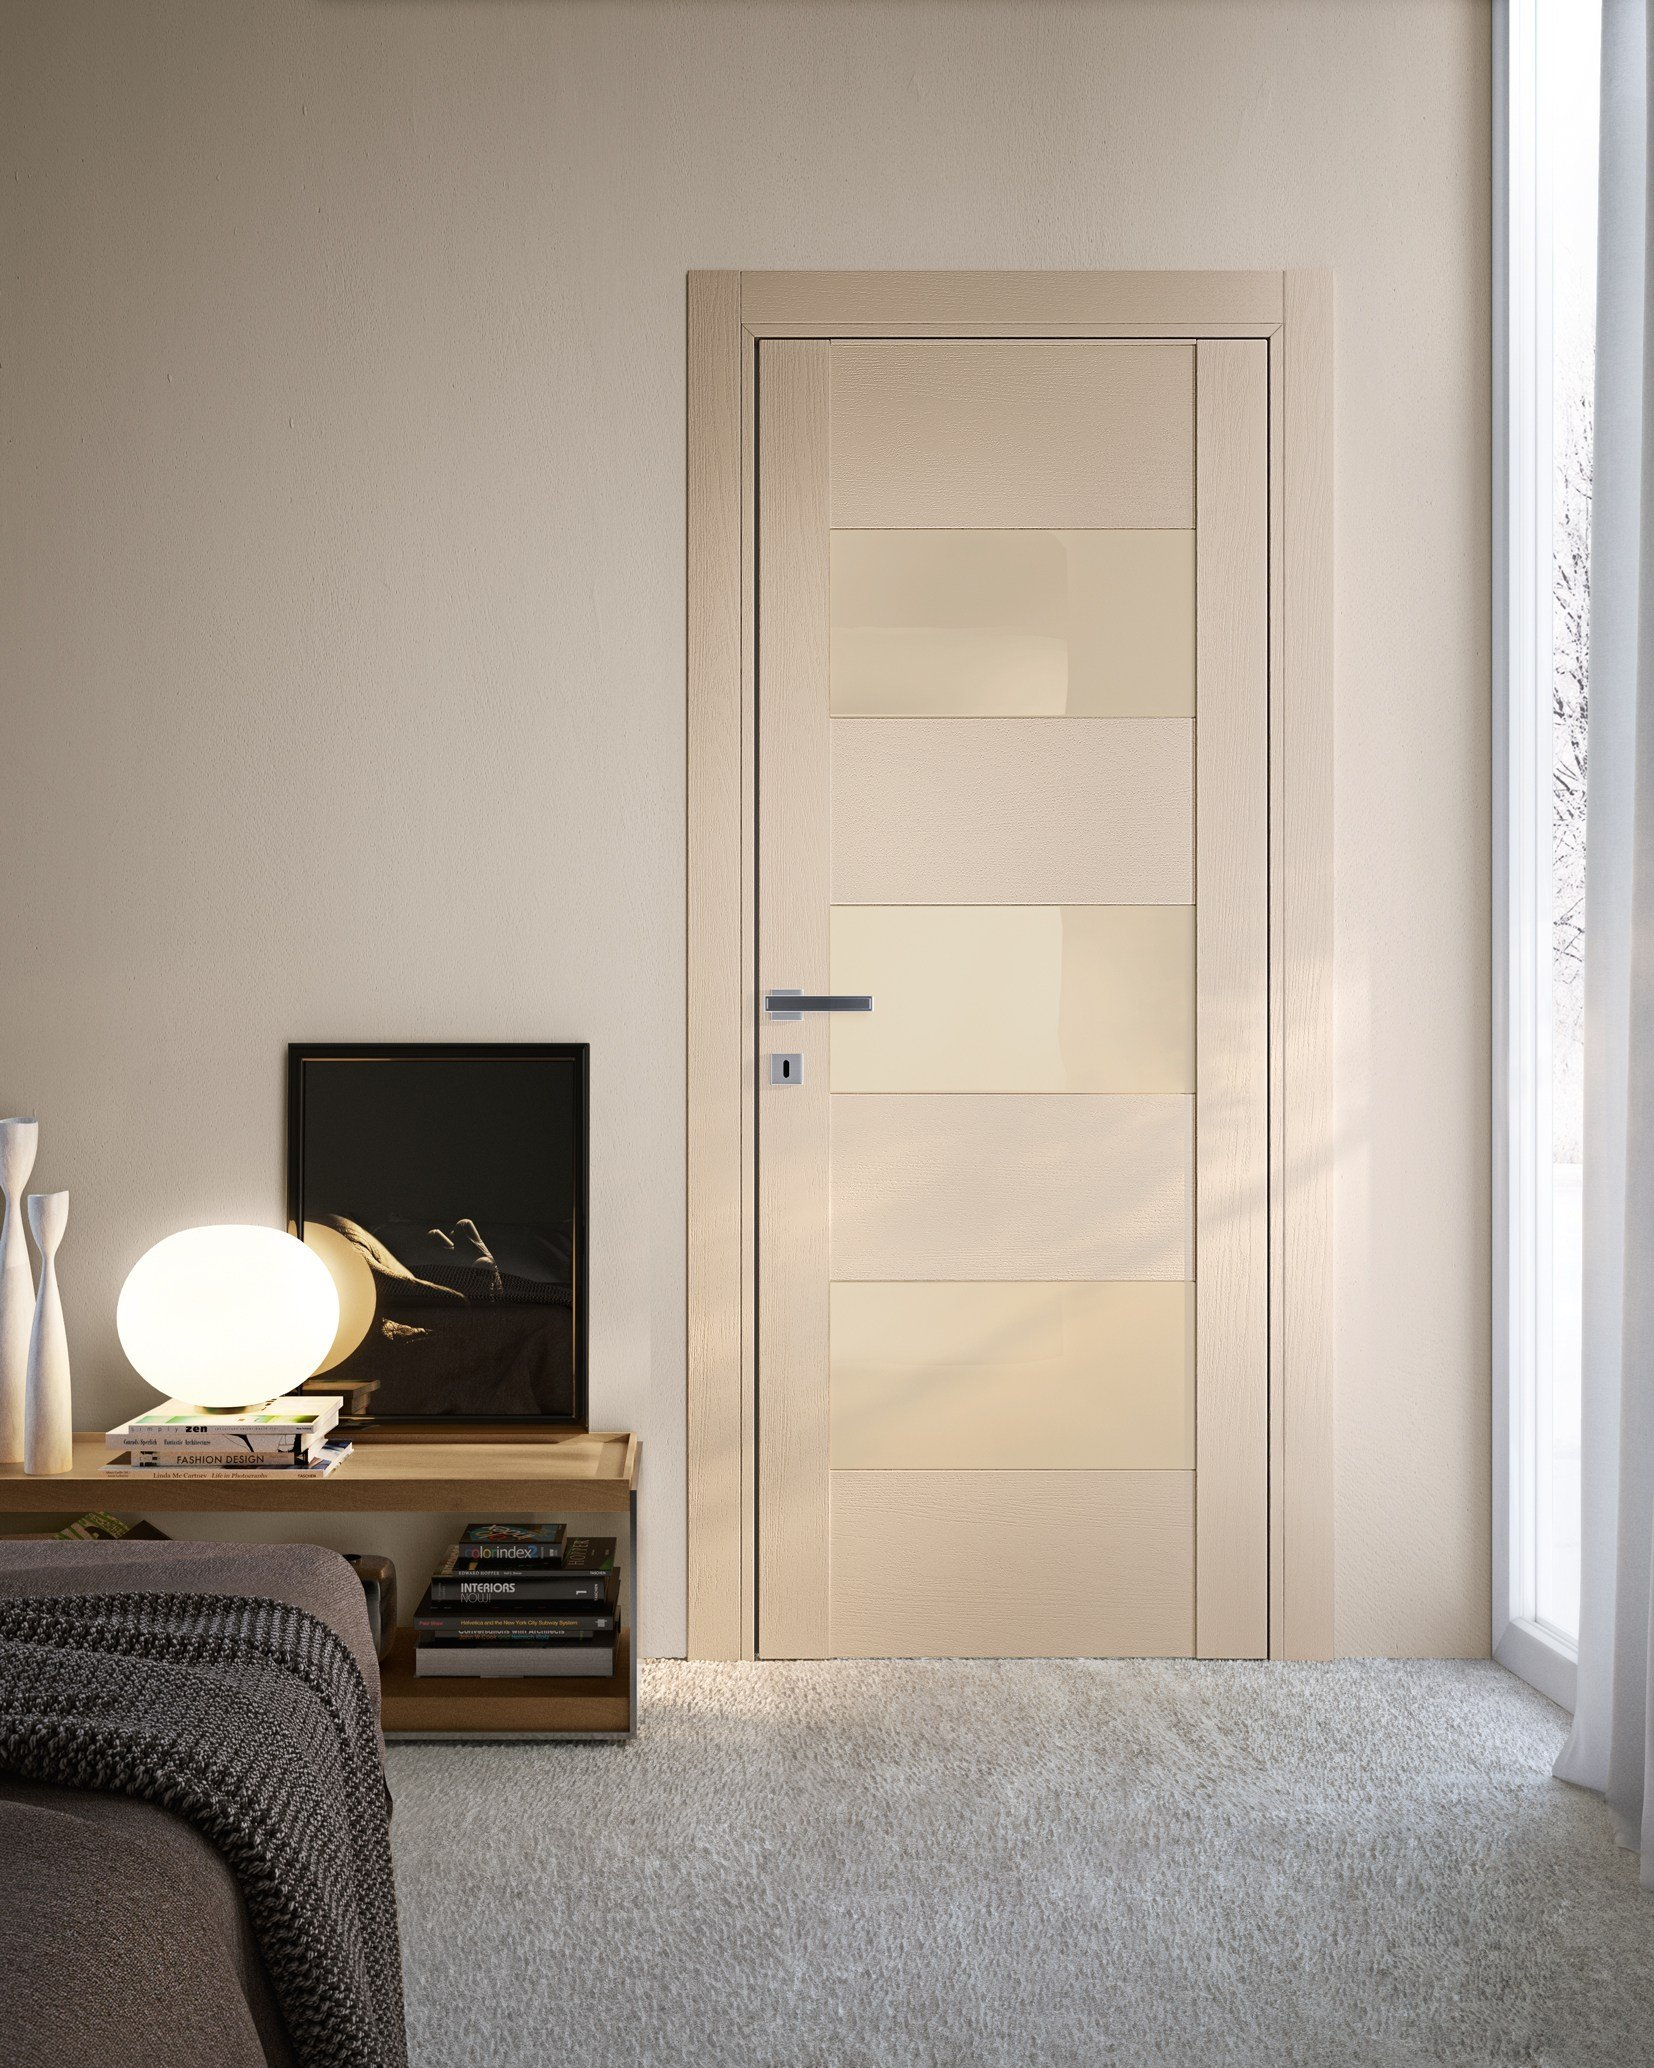 gabilia porta laccata by garofoli. Black Bedroom Furniture Sets. Home Design Ideas